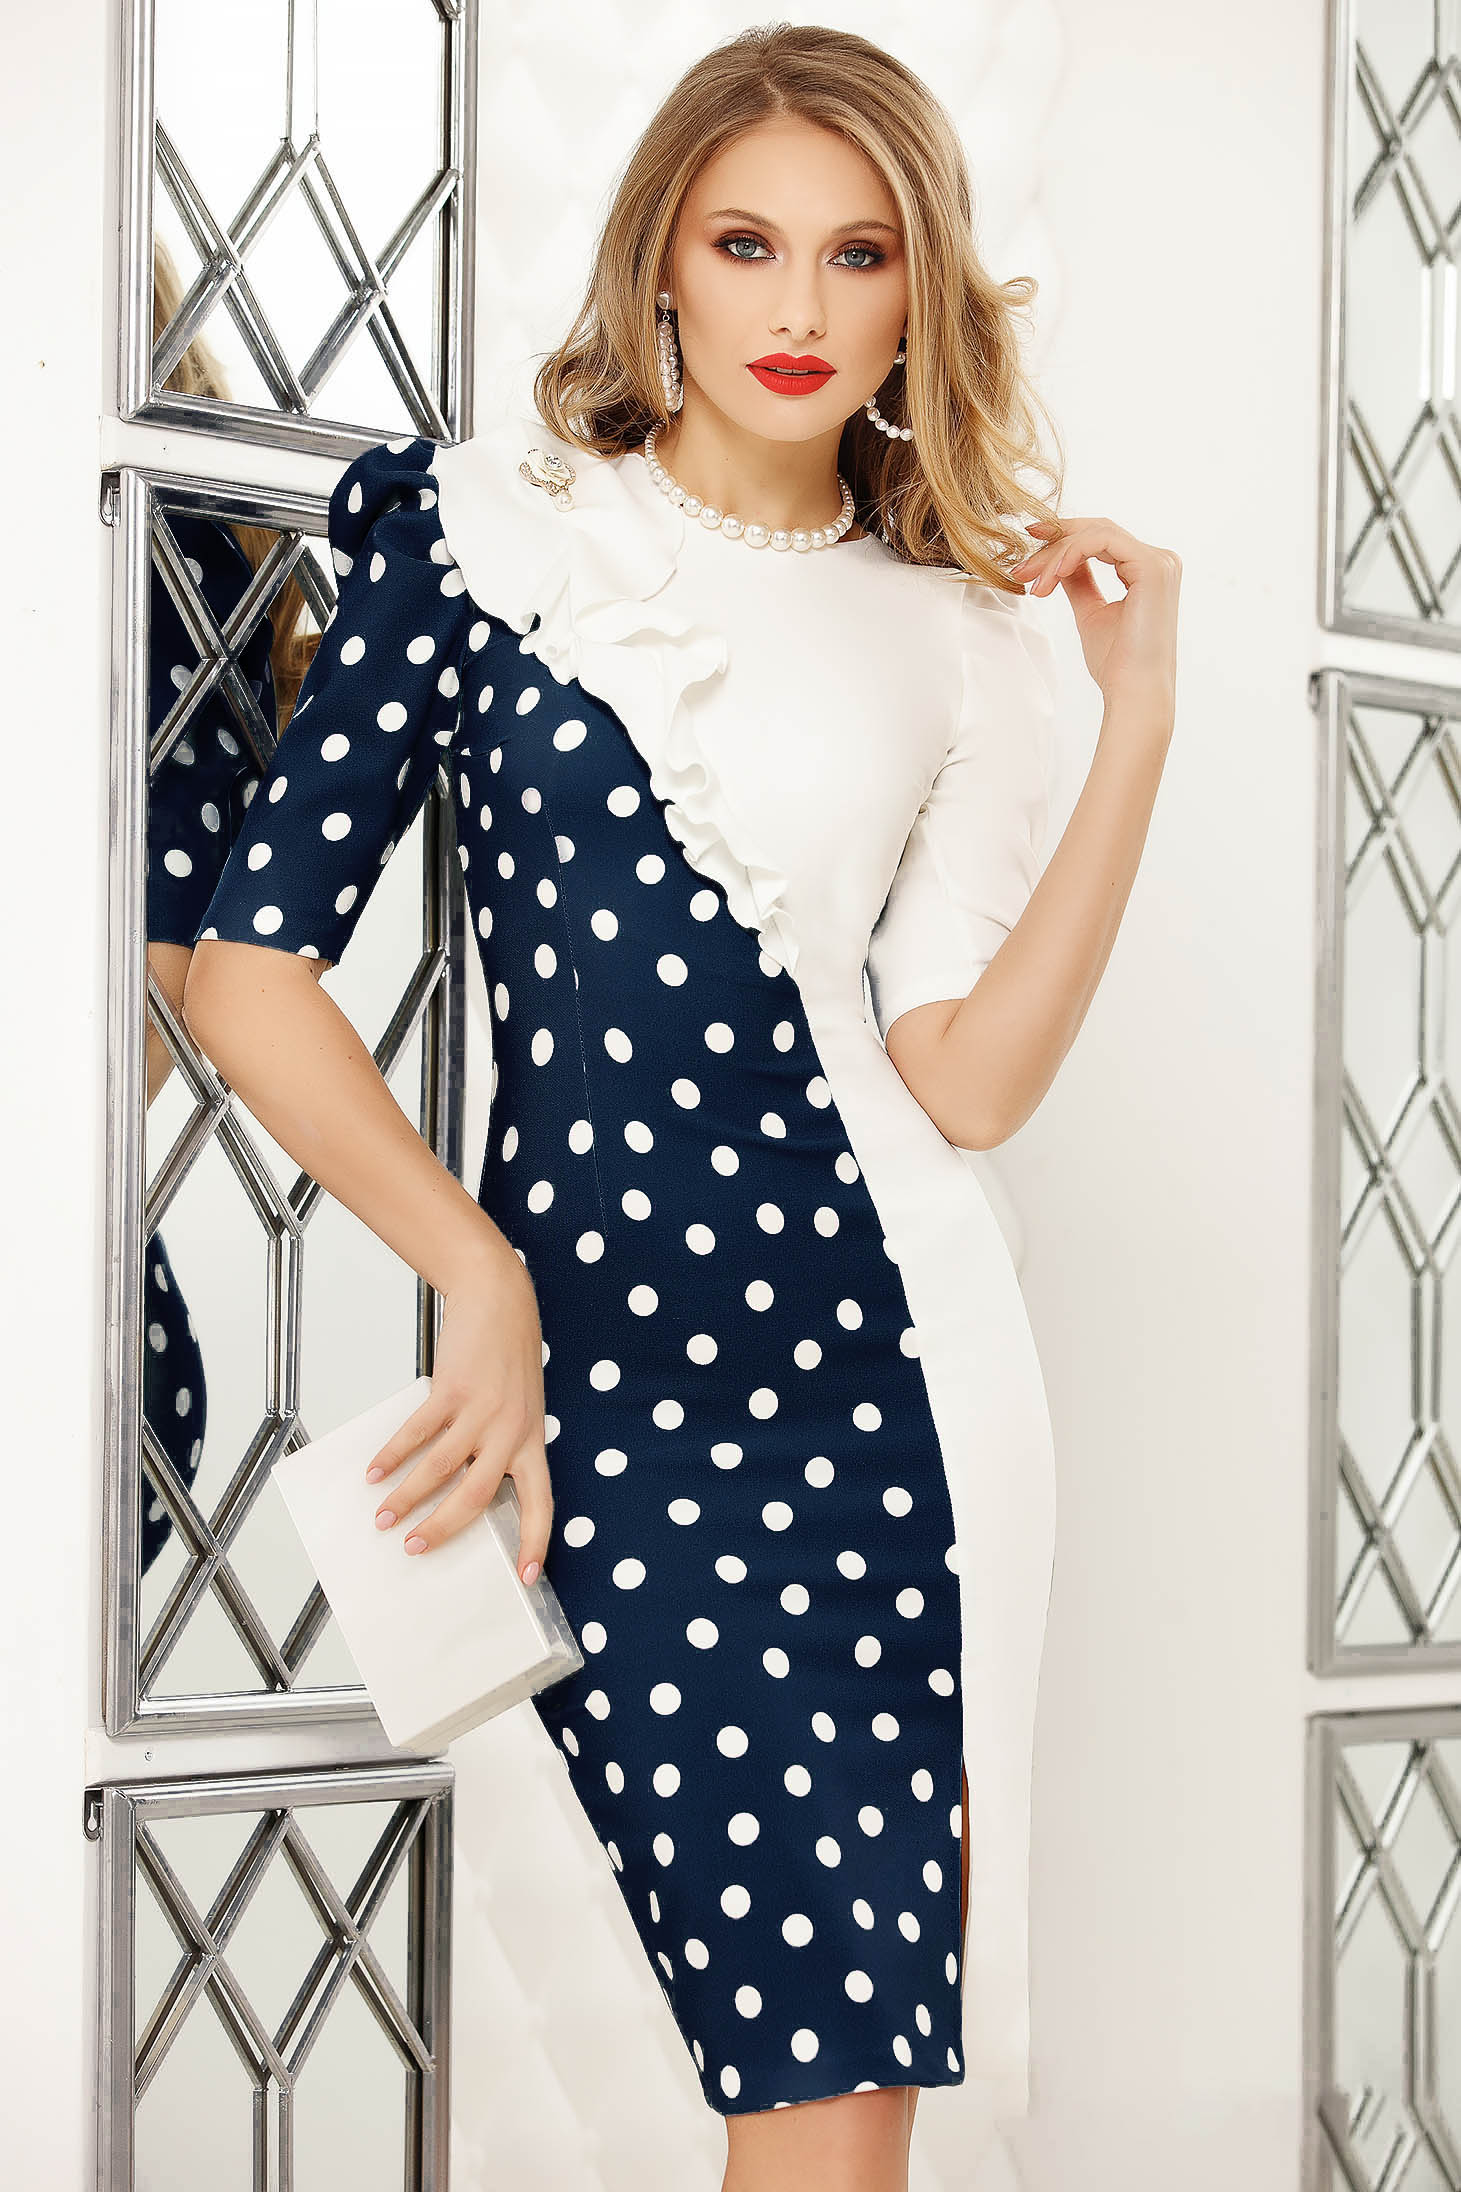 Darkblue elegant short cut pencil dress dots print with ruffle details